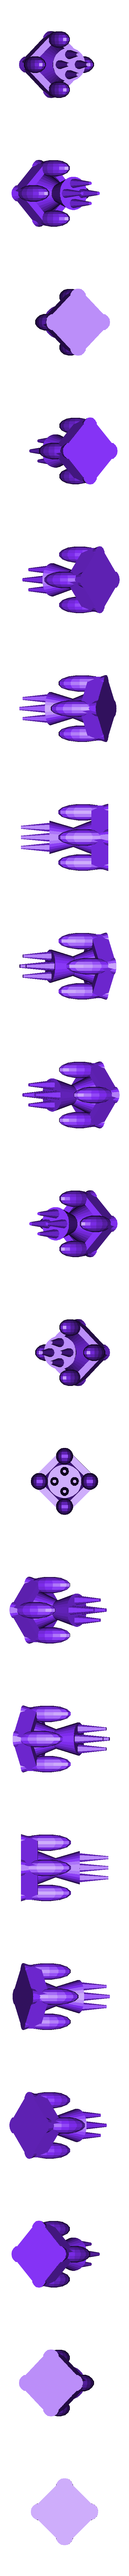 egg_hourglass_castle.stl Download free SCAD file Openscad Tutorial - Random Egg Hourglass Structure • 3D print object, Urukog